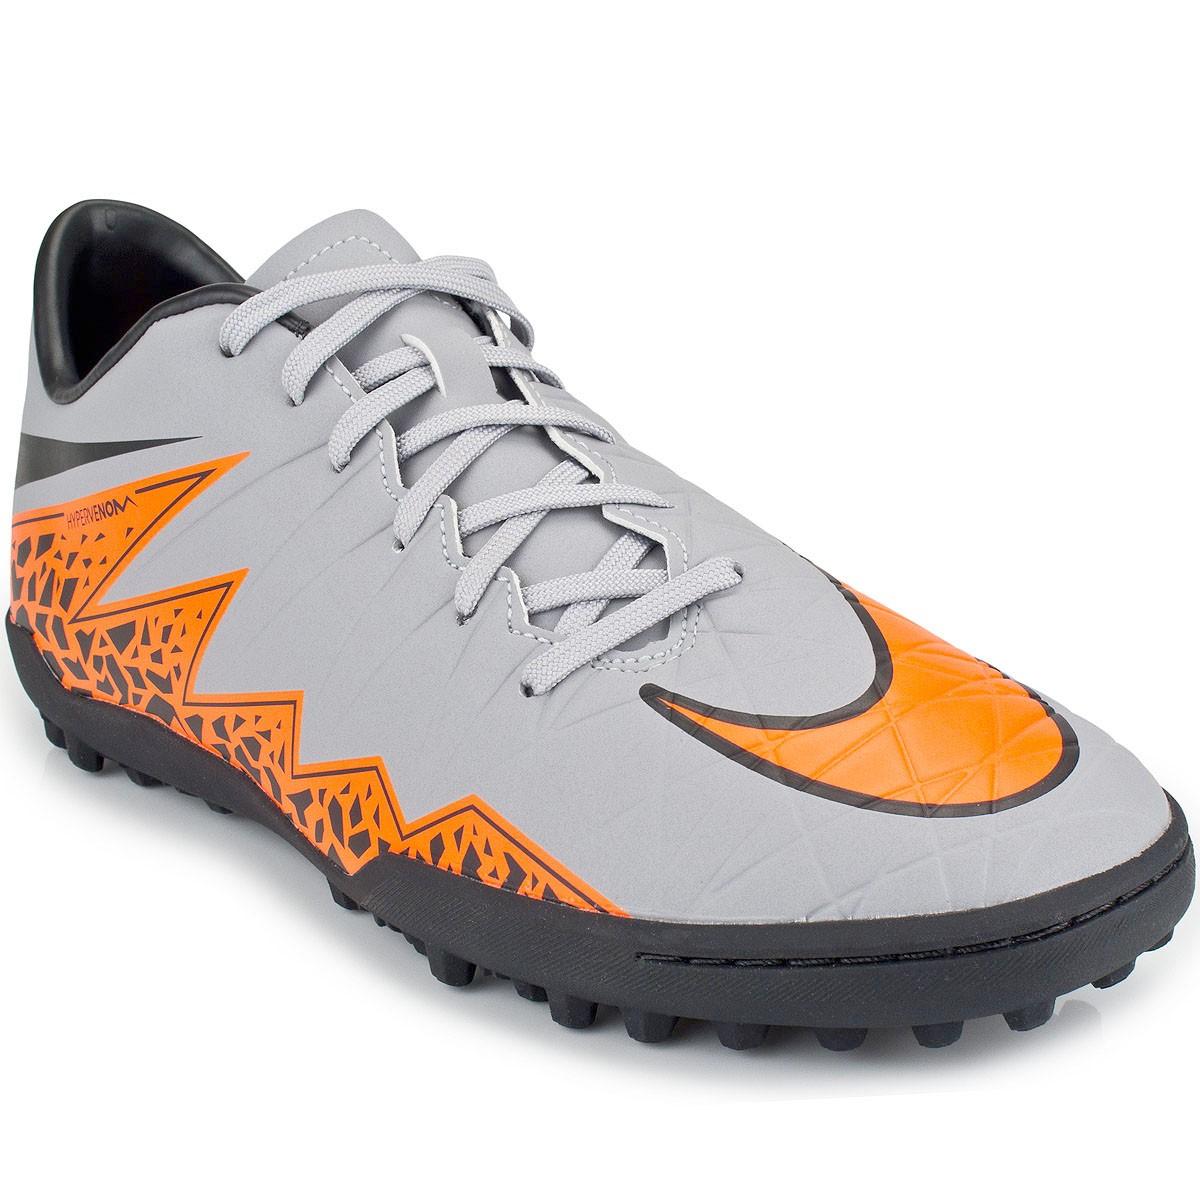 0acfebb52d Chuteira Nike Hypervenom Phelon II TF